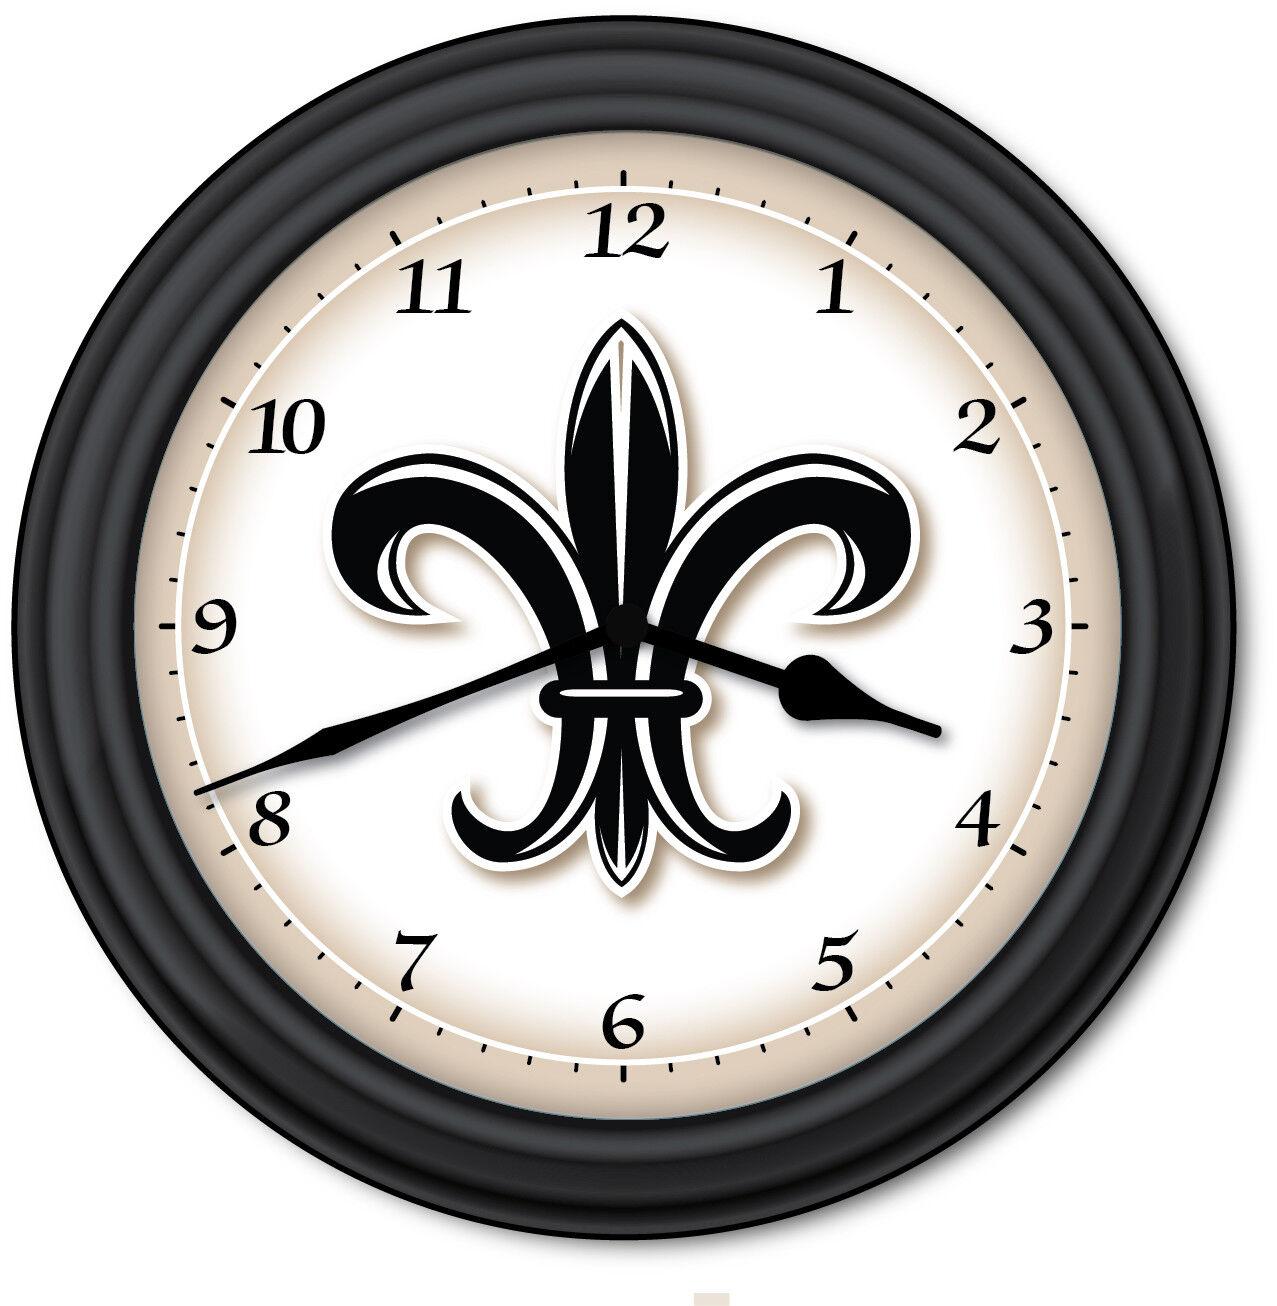 Fleur De Lis Pendulum Wall Clock Mini Black Ballard French Country Designs 0 For Sale Online Ebay